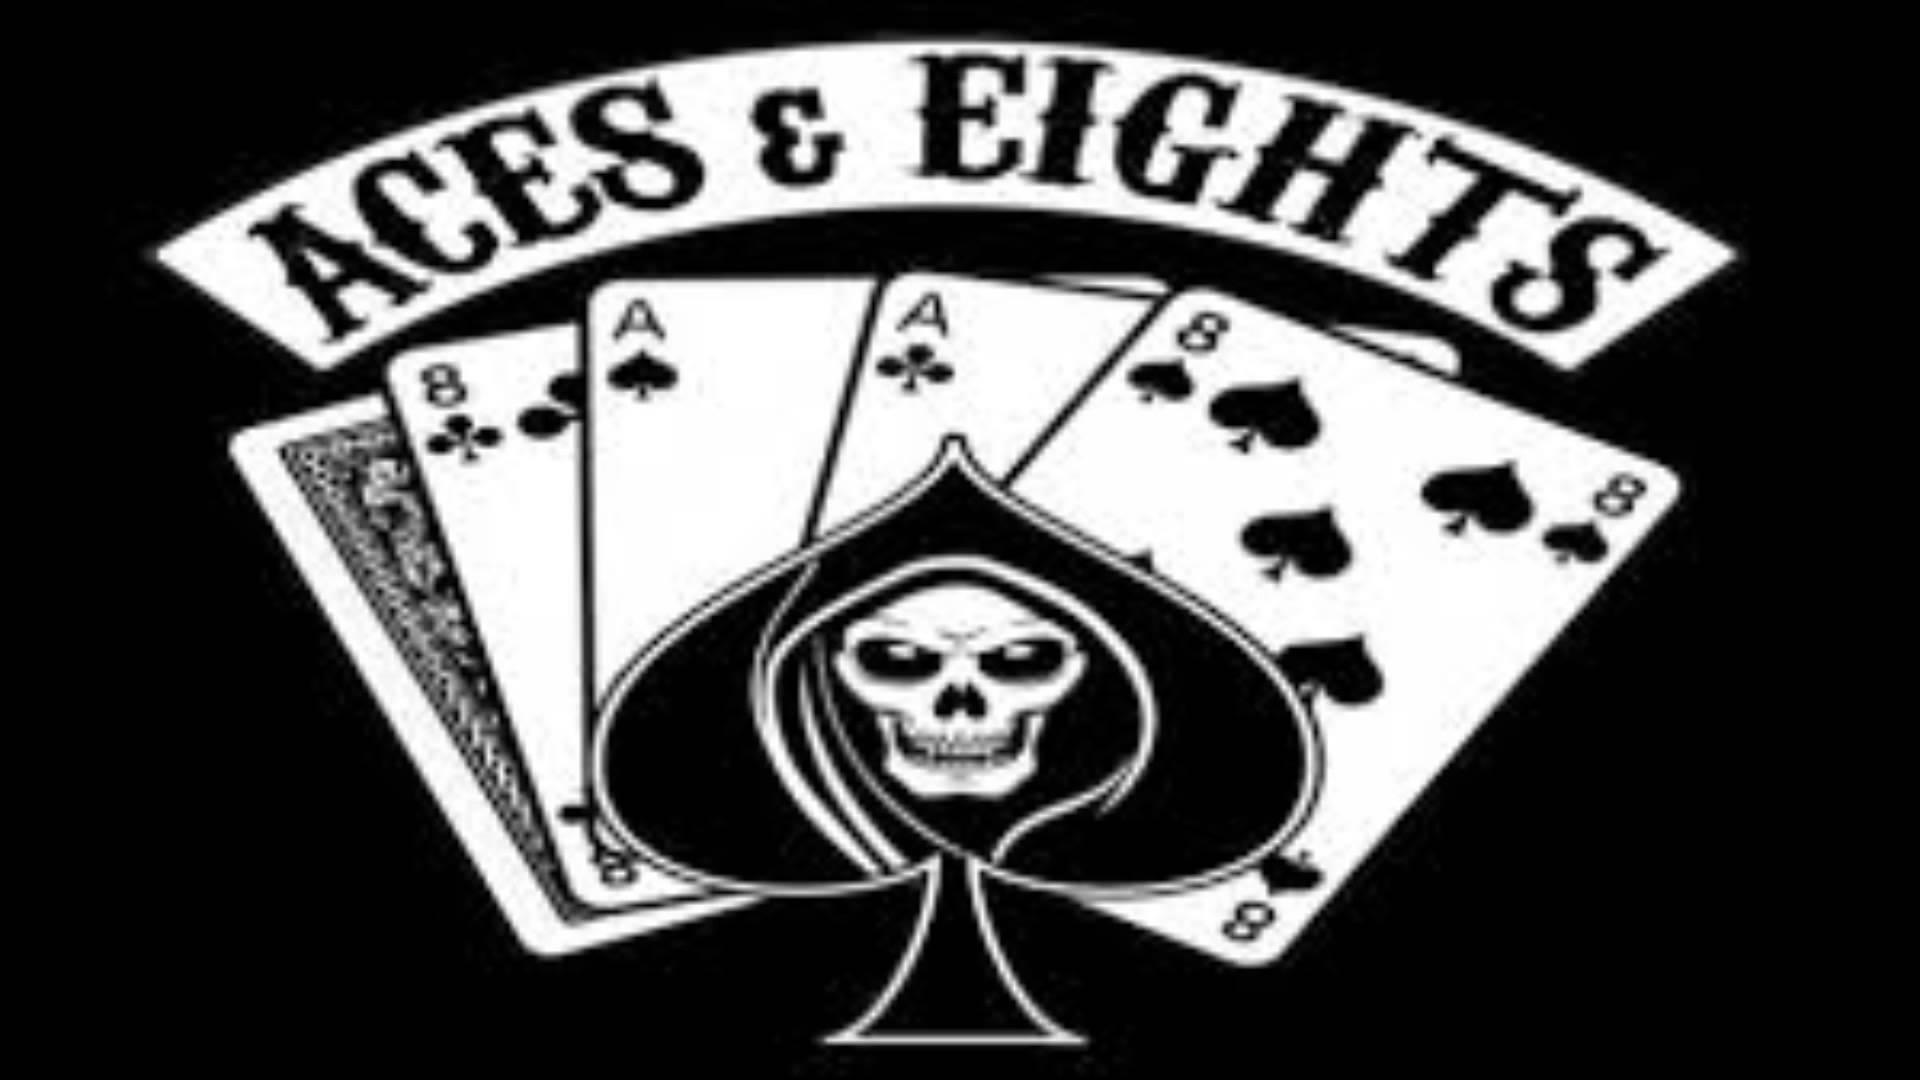 Aces & Eights - Deadman's Hand (Lyrical Verison) - YouTube